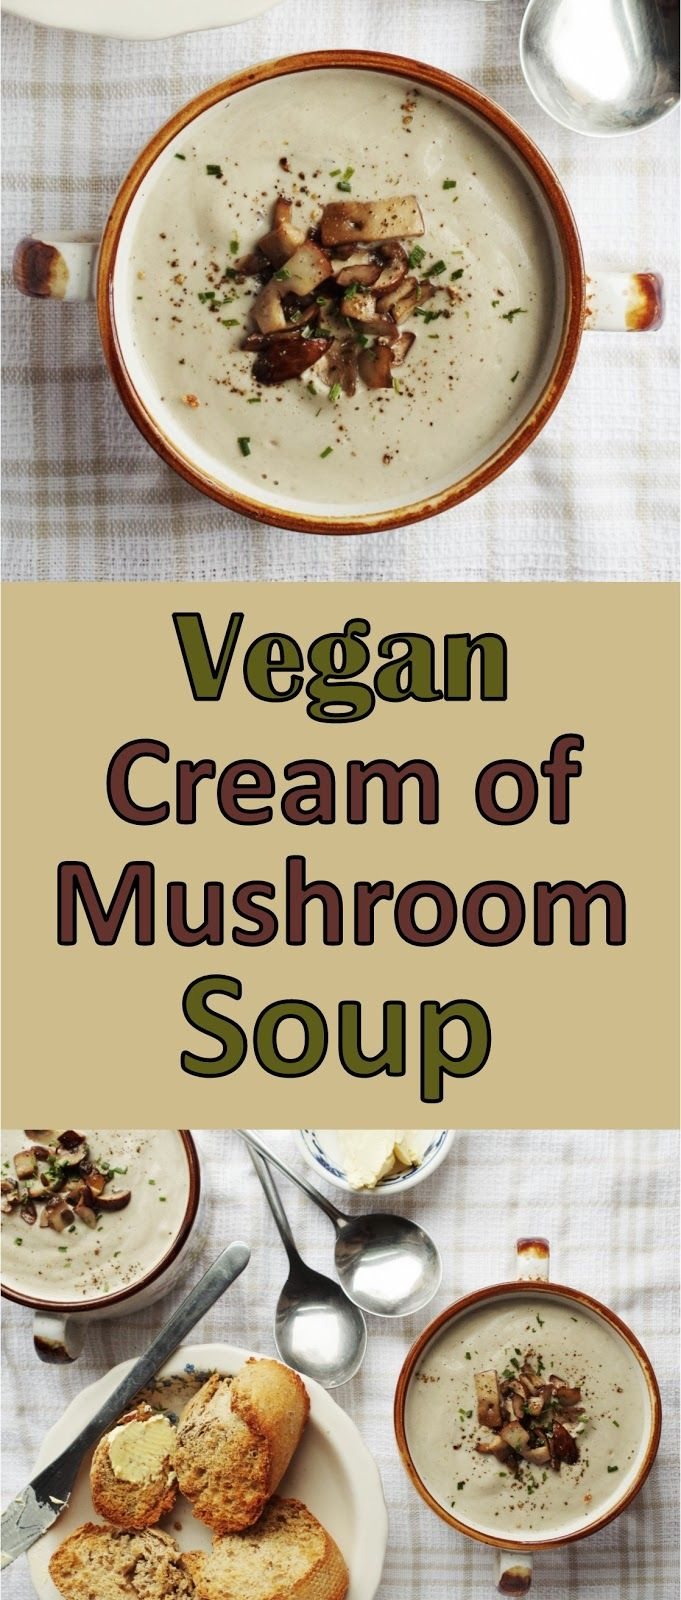 Cream of Mushroom Soup |Euphoric Vegan